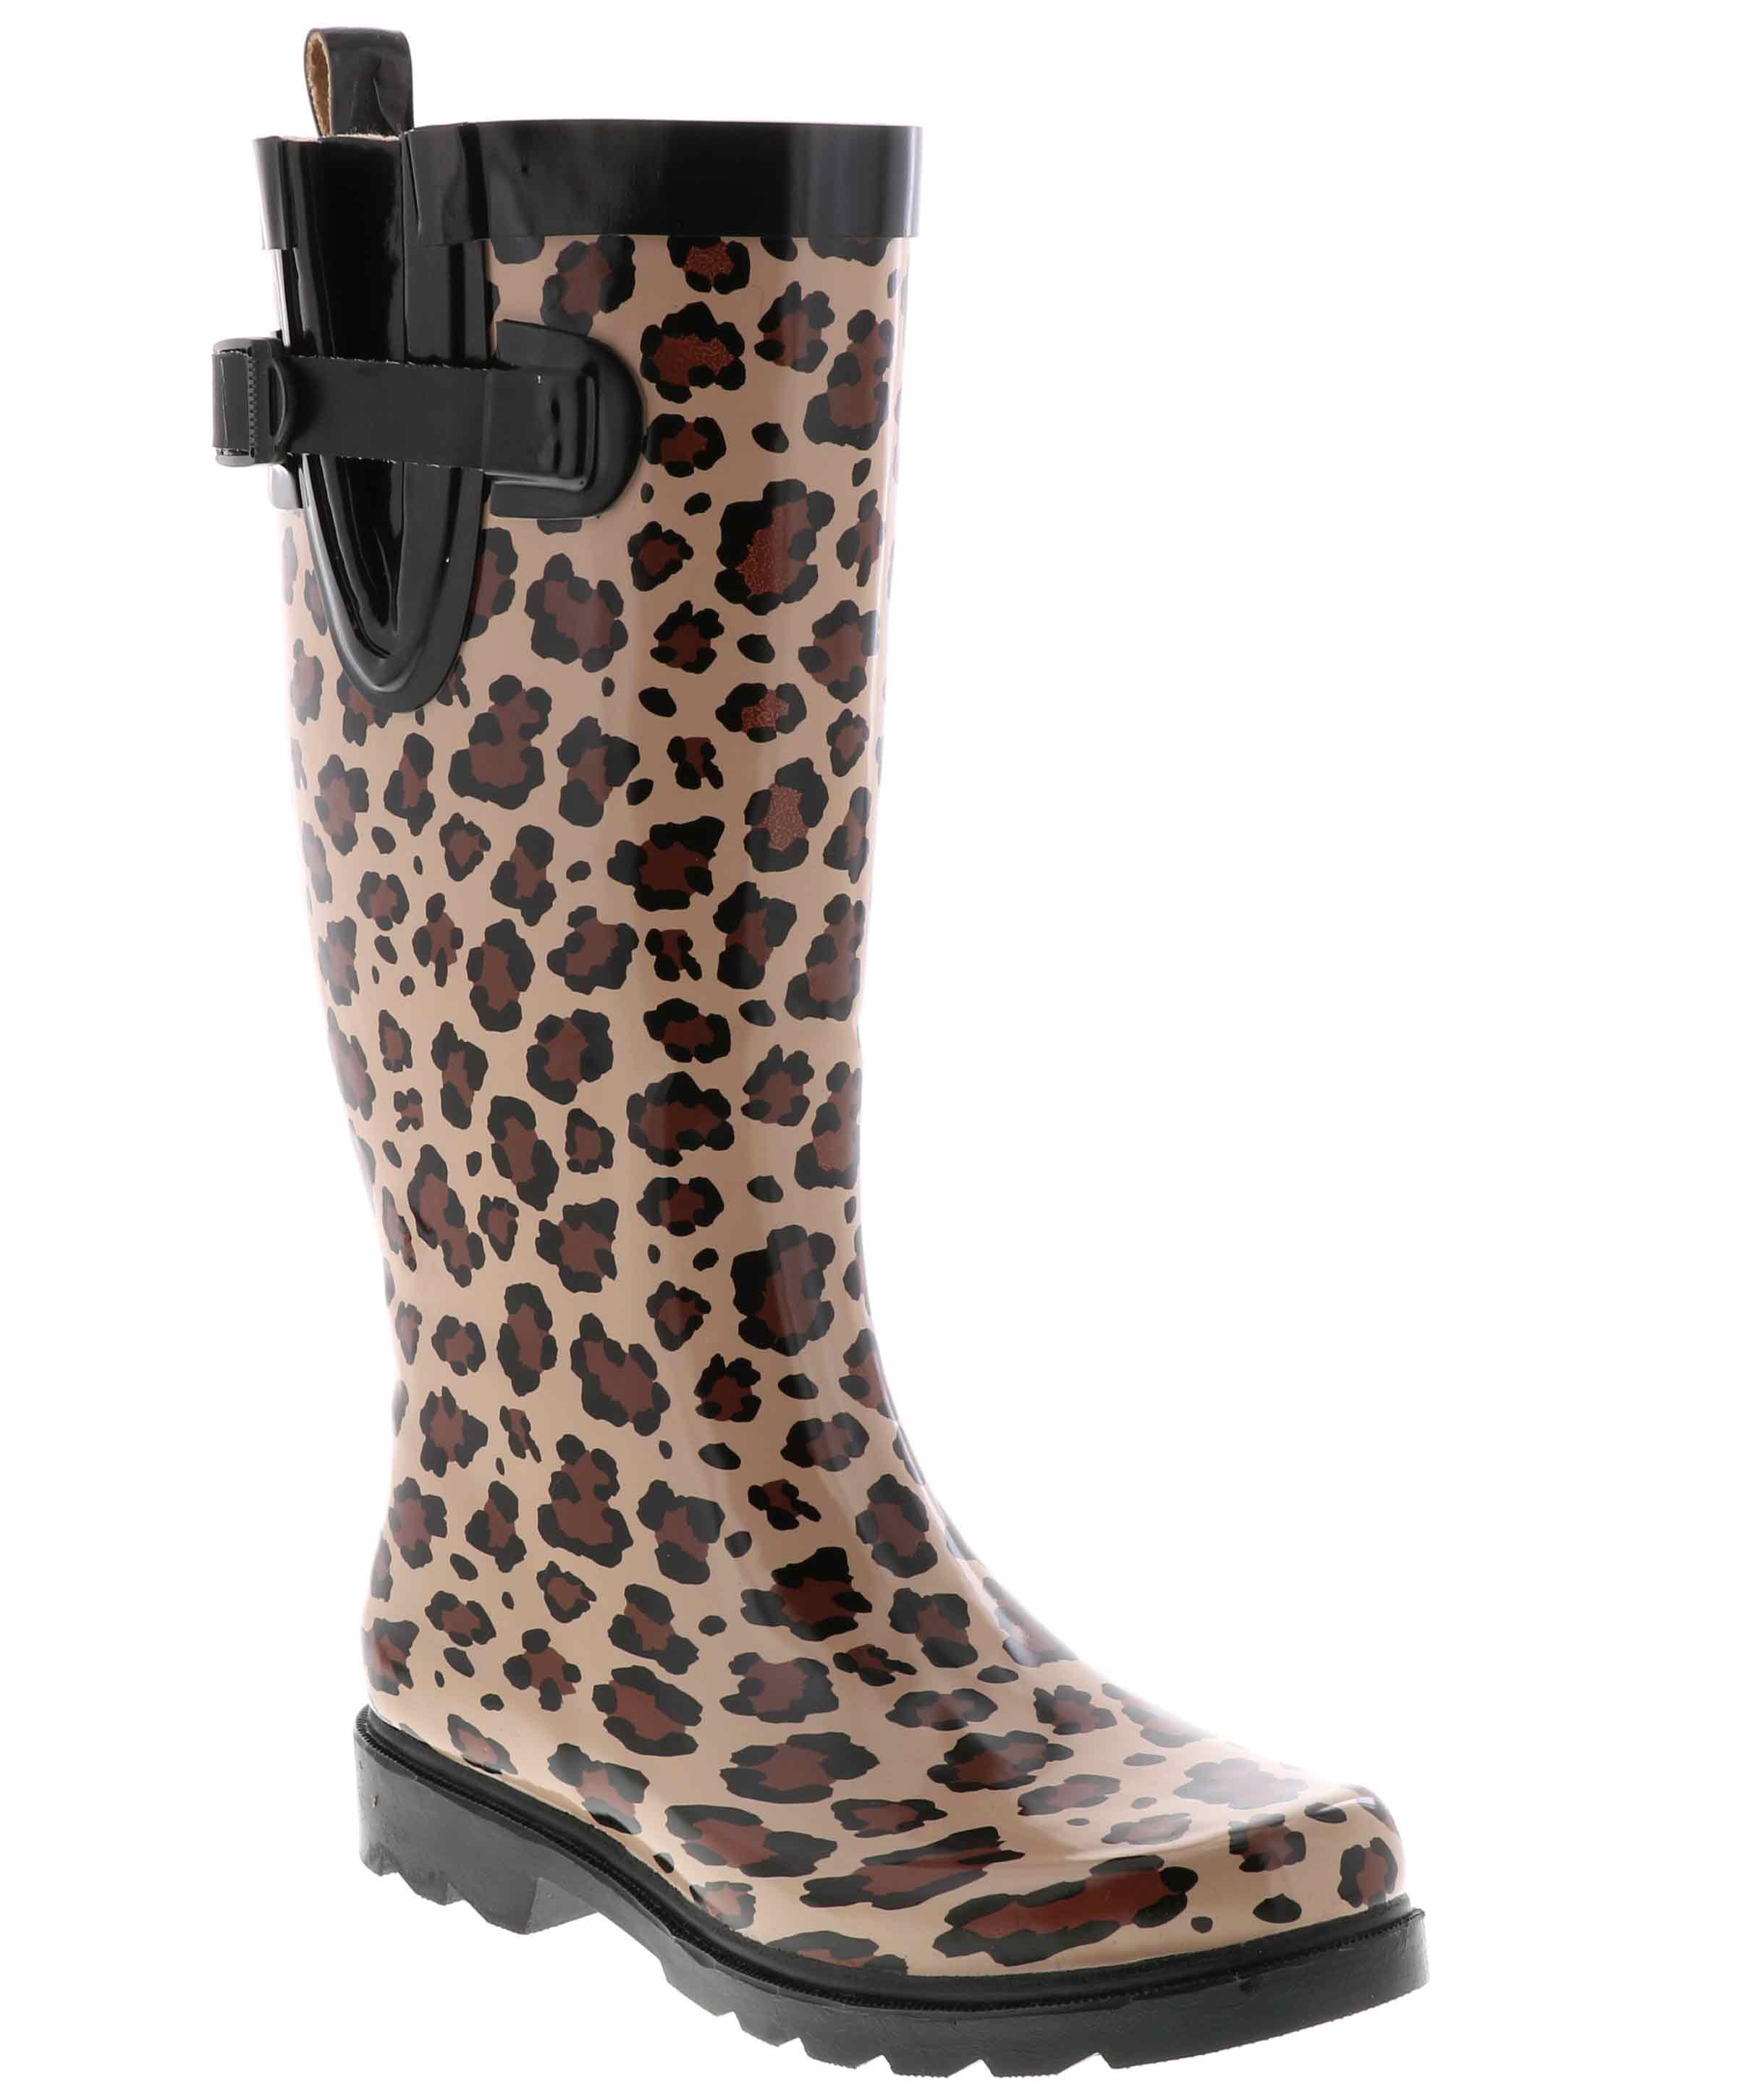 Women's Capelli Natural Leopard